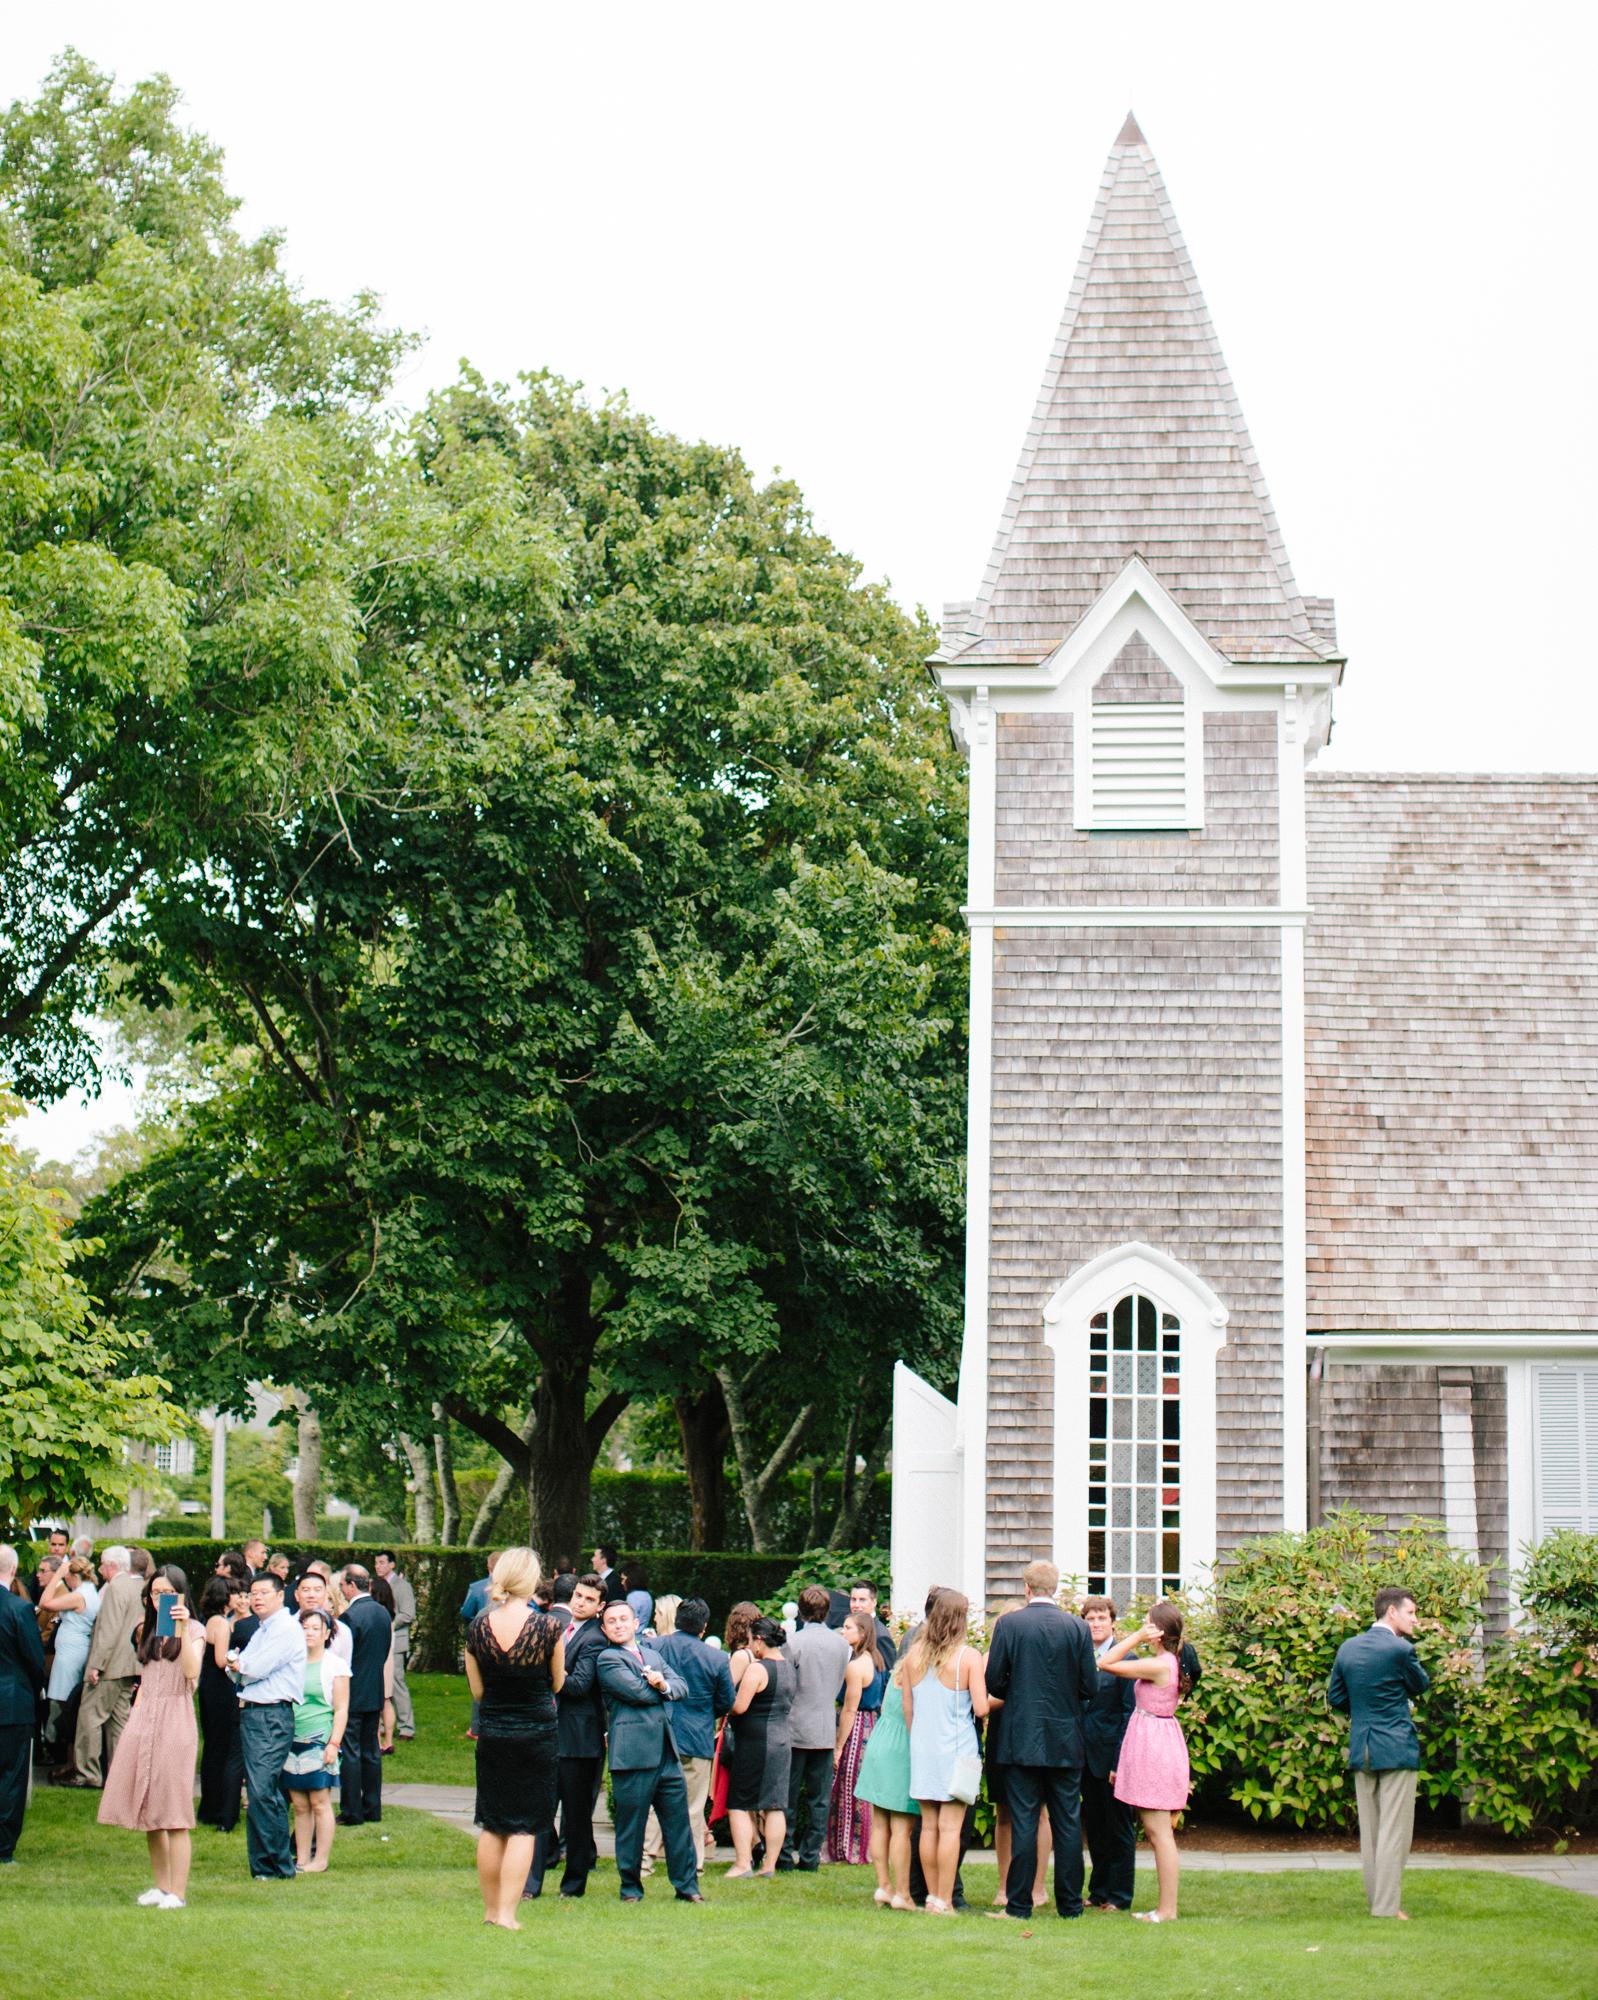 kristen-jonathan-wedding-church-0966-s112193-1015.jpg